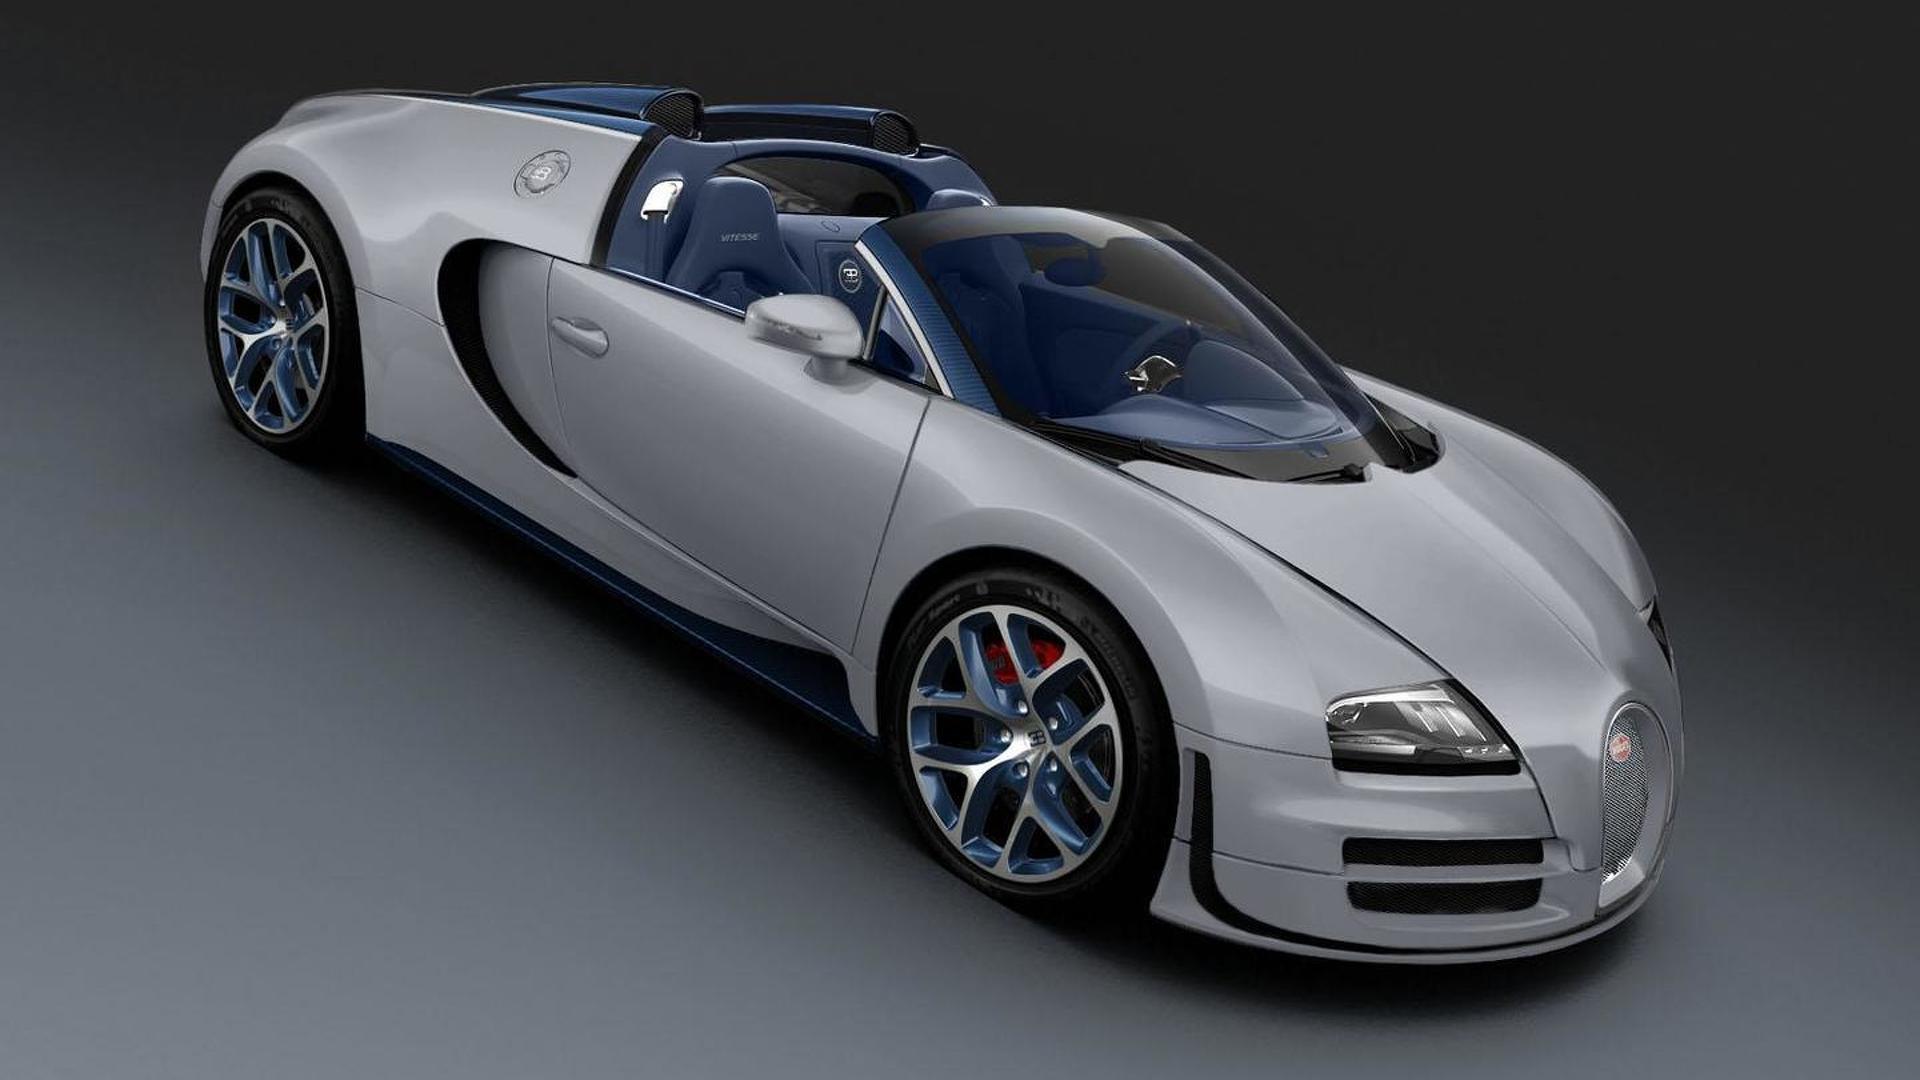 Bugatti Veyron 16 4 Grand Sport Vitesse Rafale Special Edition Bows